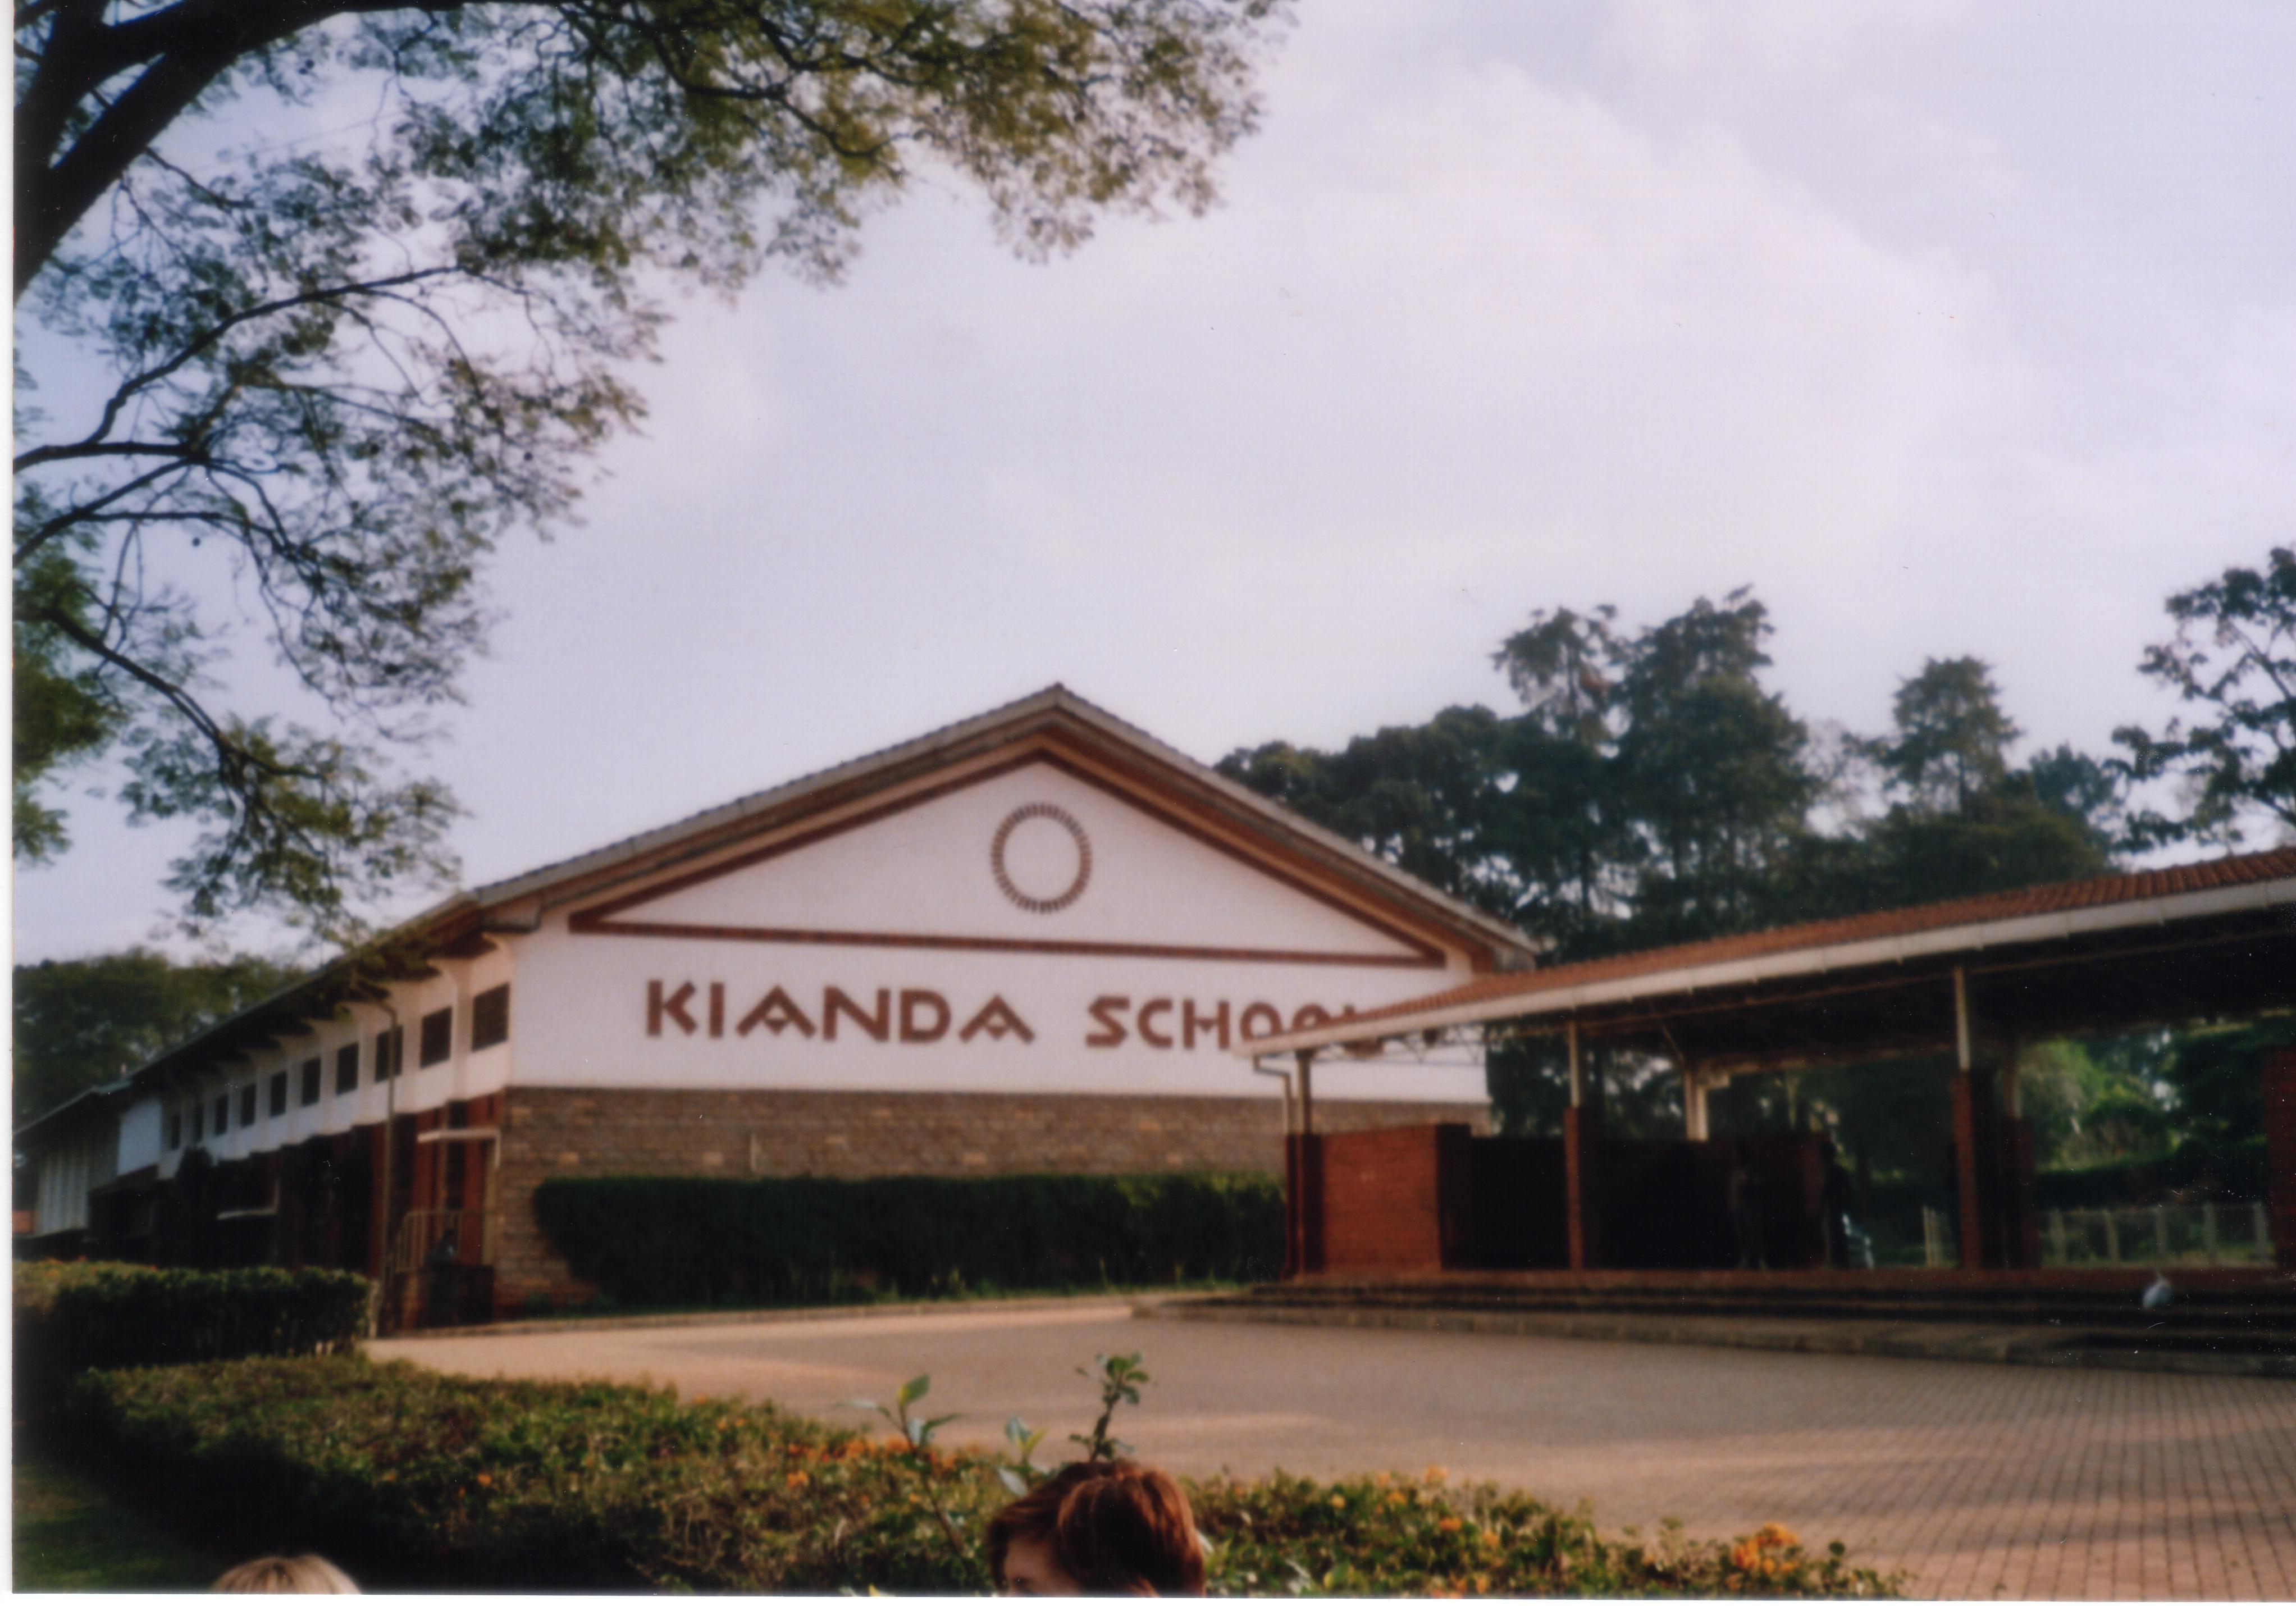 Kianda School